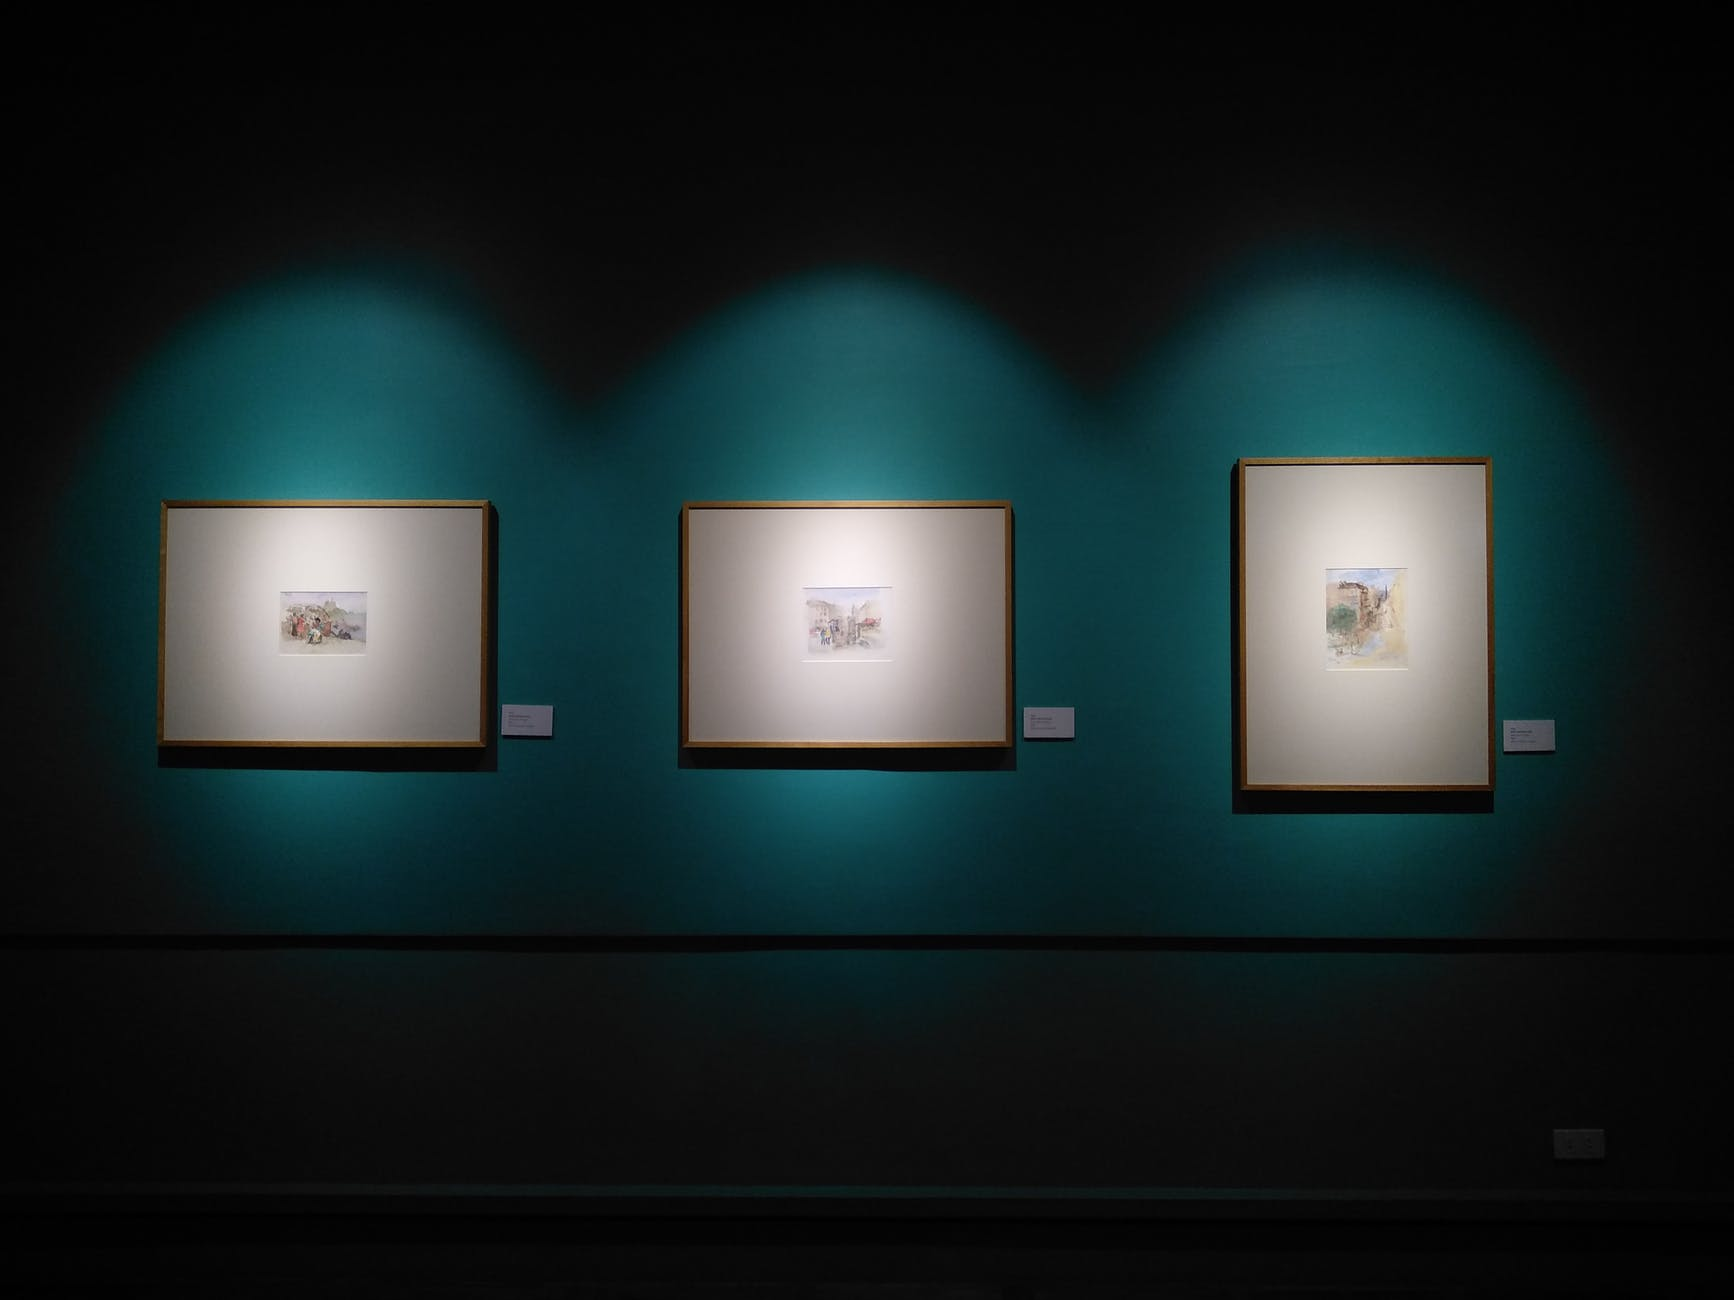 three paintings hanging in gallery